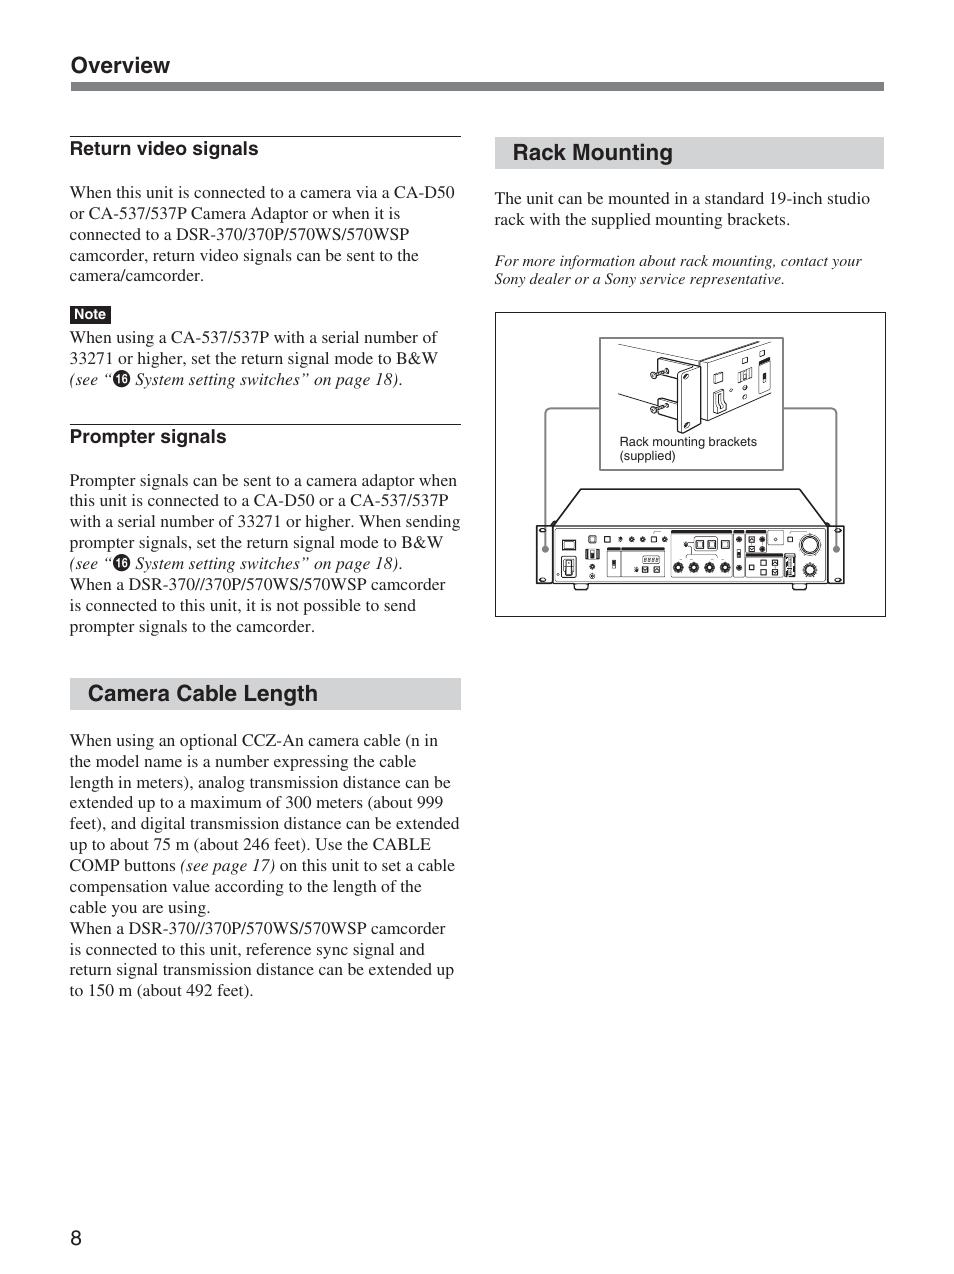 sony dsr 300 Array - camera cable length rack mounting overview sony ccu  d50 user rh manualsdir com